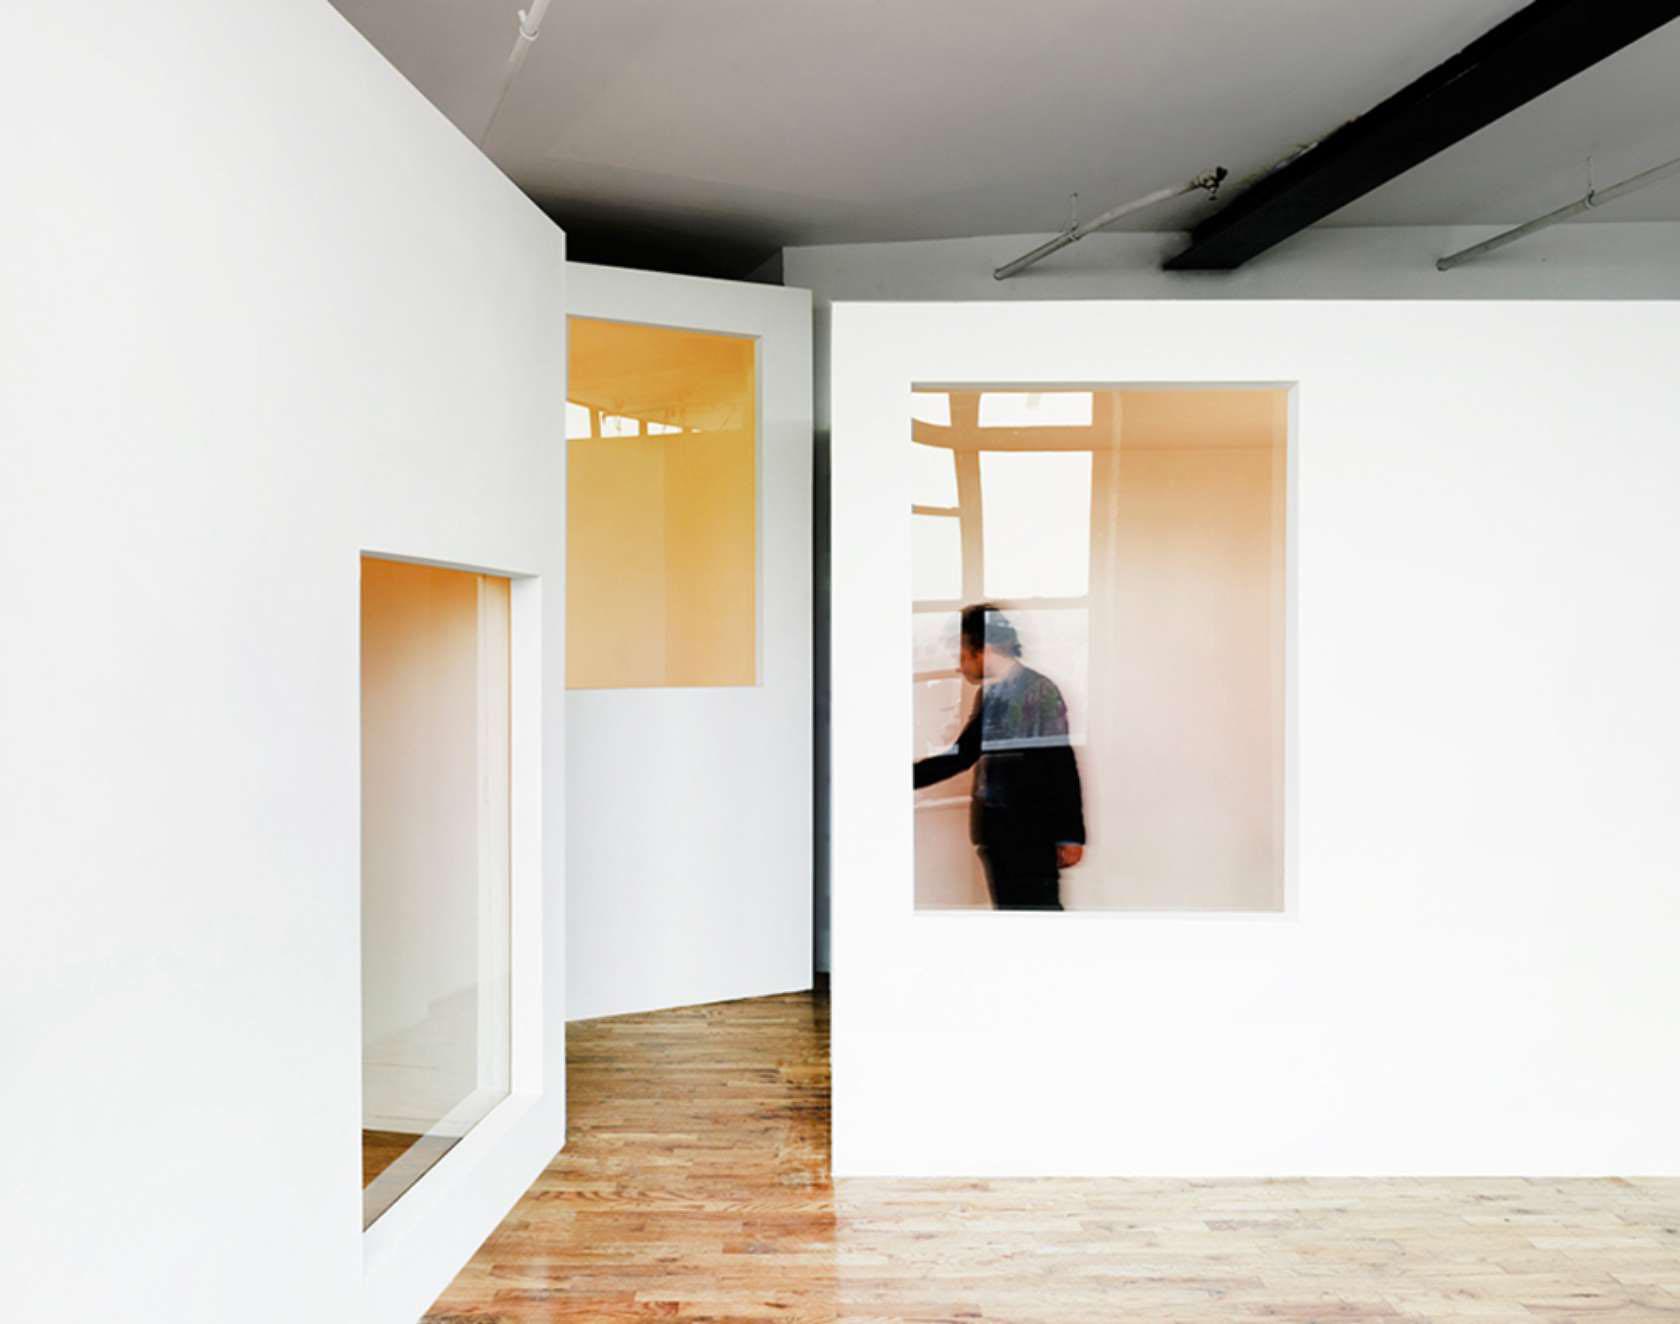 studio cadena transforms awkward 600 sq ft bushwick loft